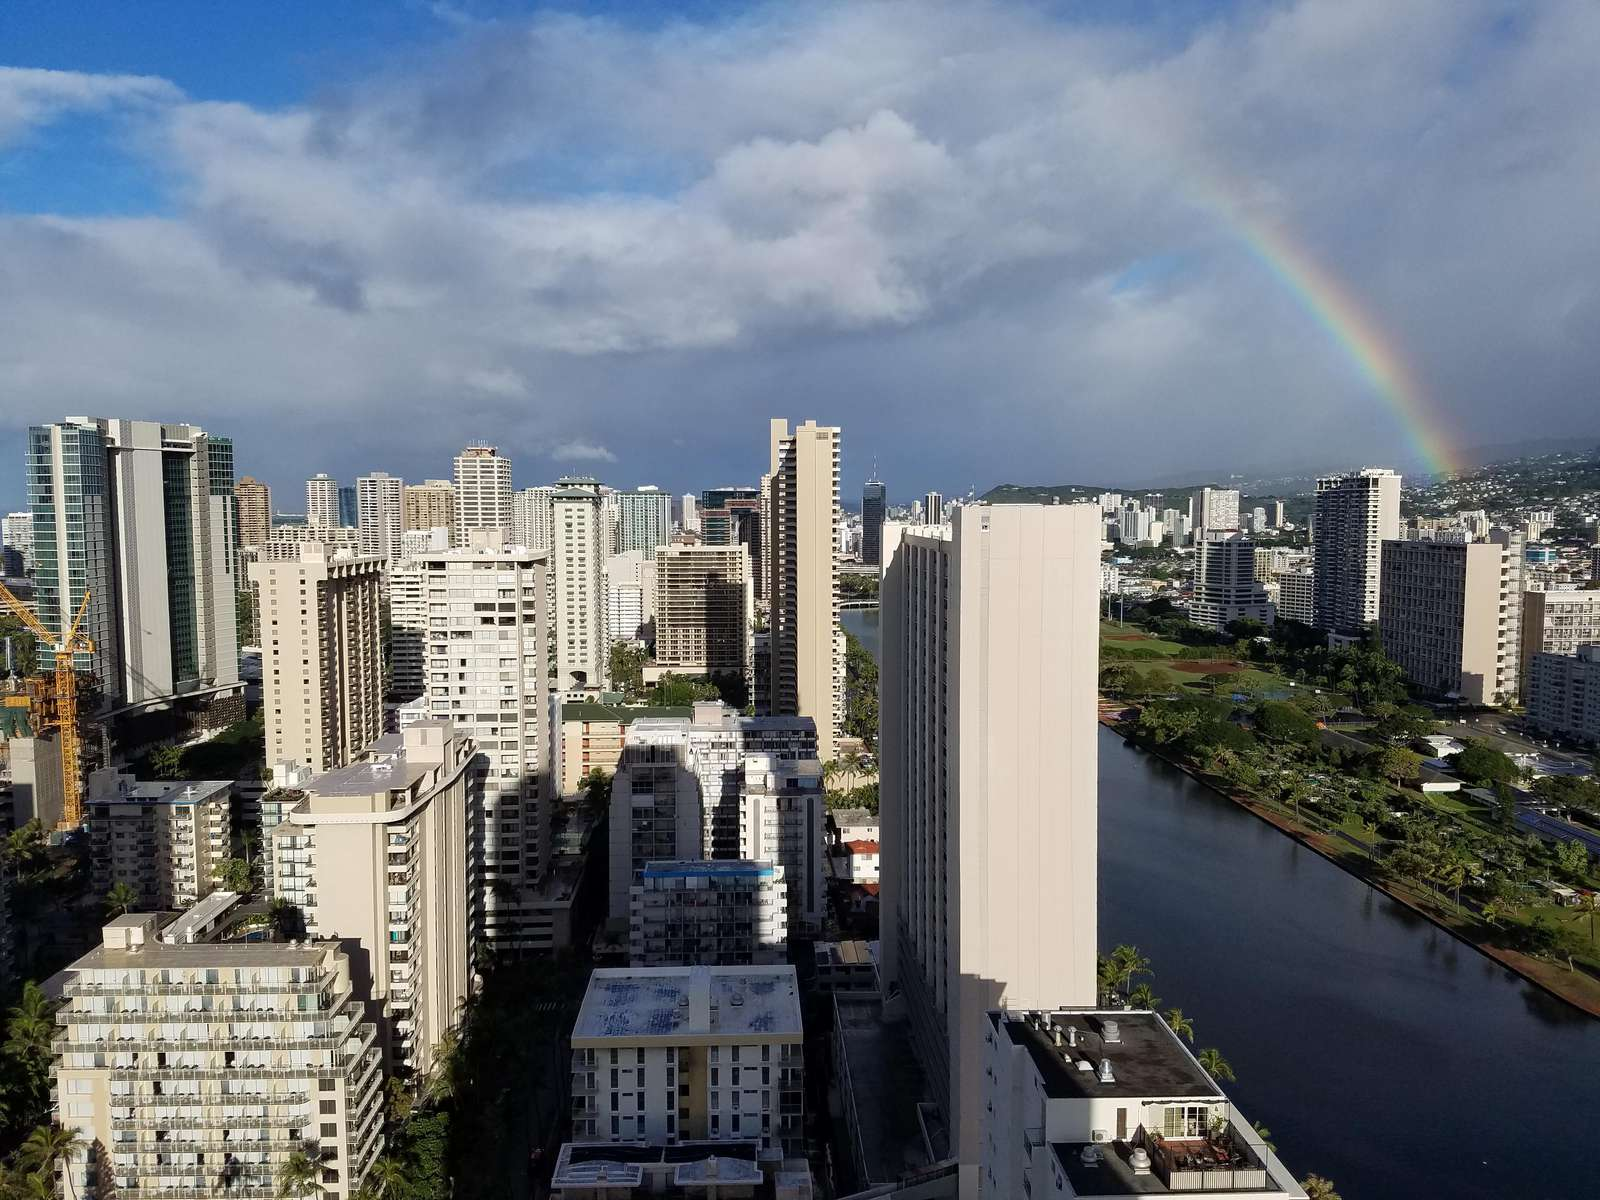 Rainbow over the Ala Wai from the Lanai